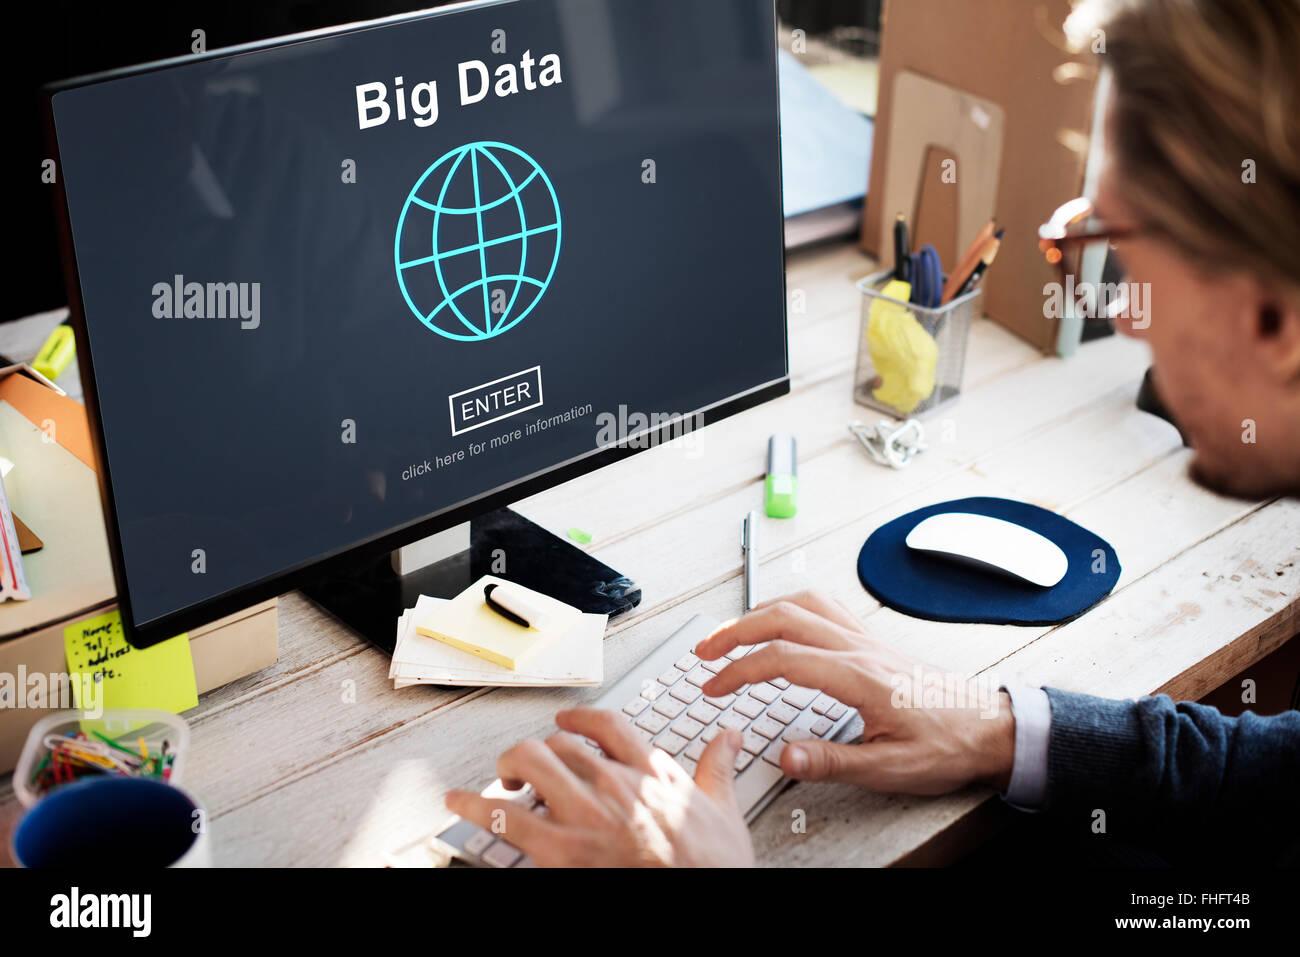 Big Data Information Storage System Network Technology Concept - Stock Image